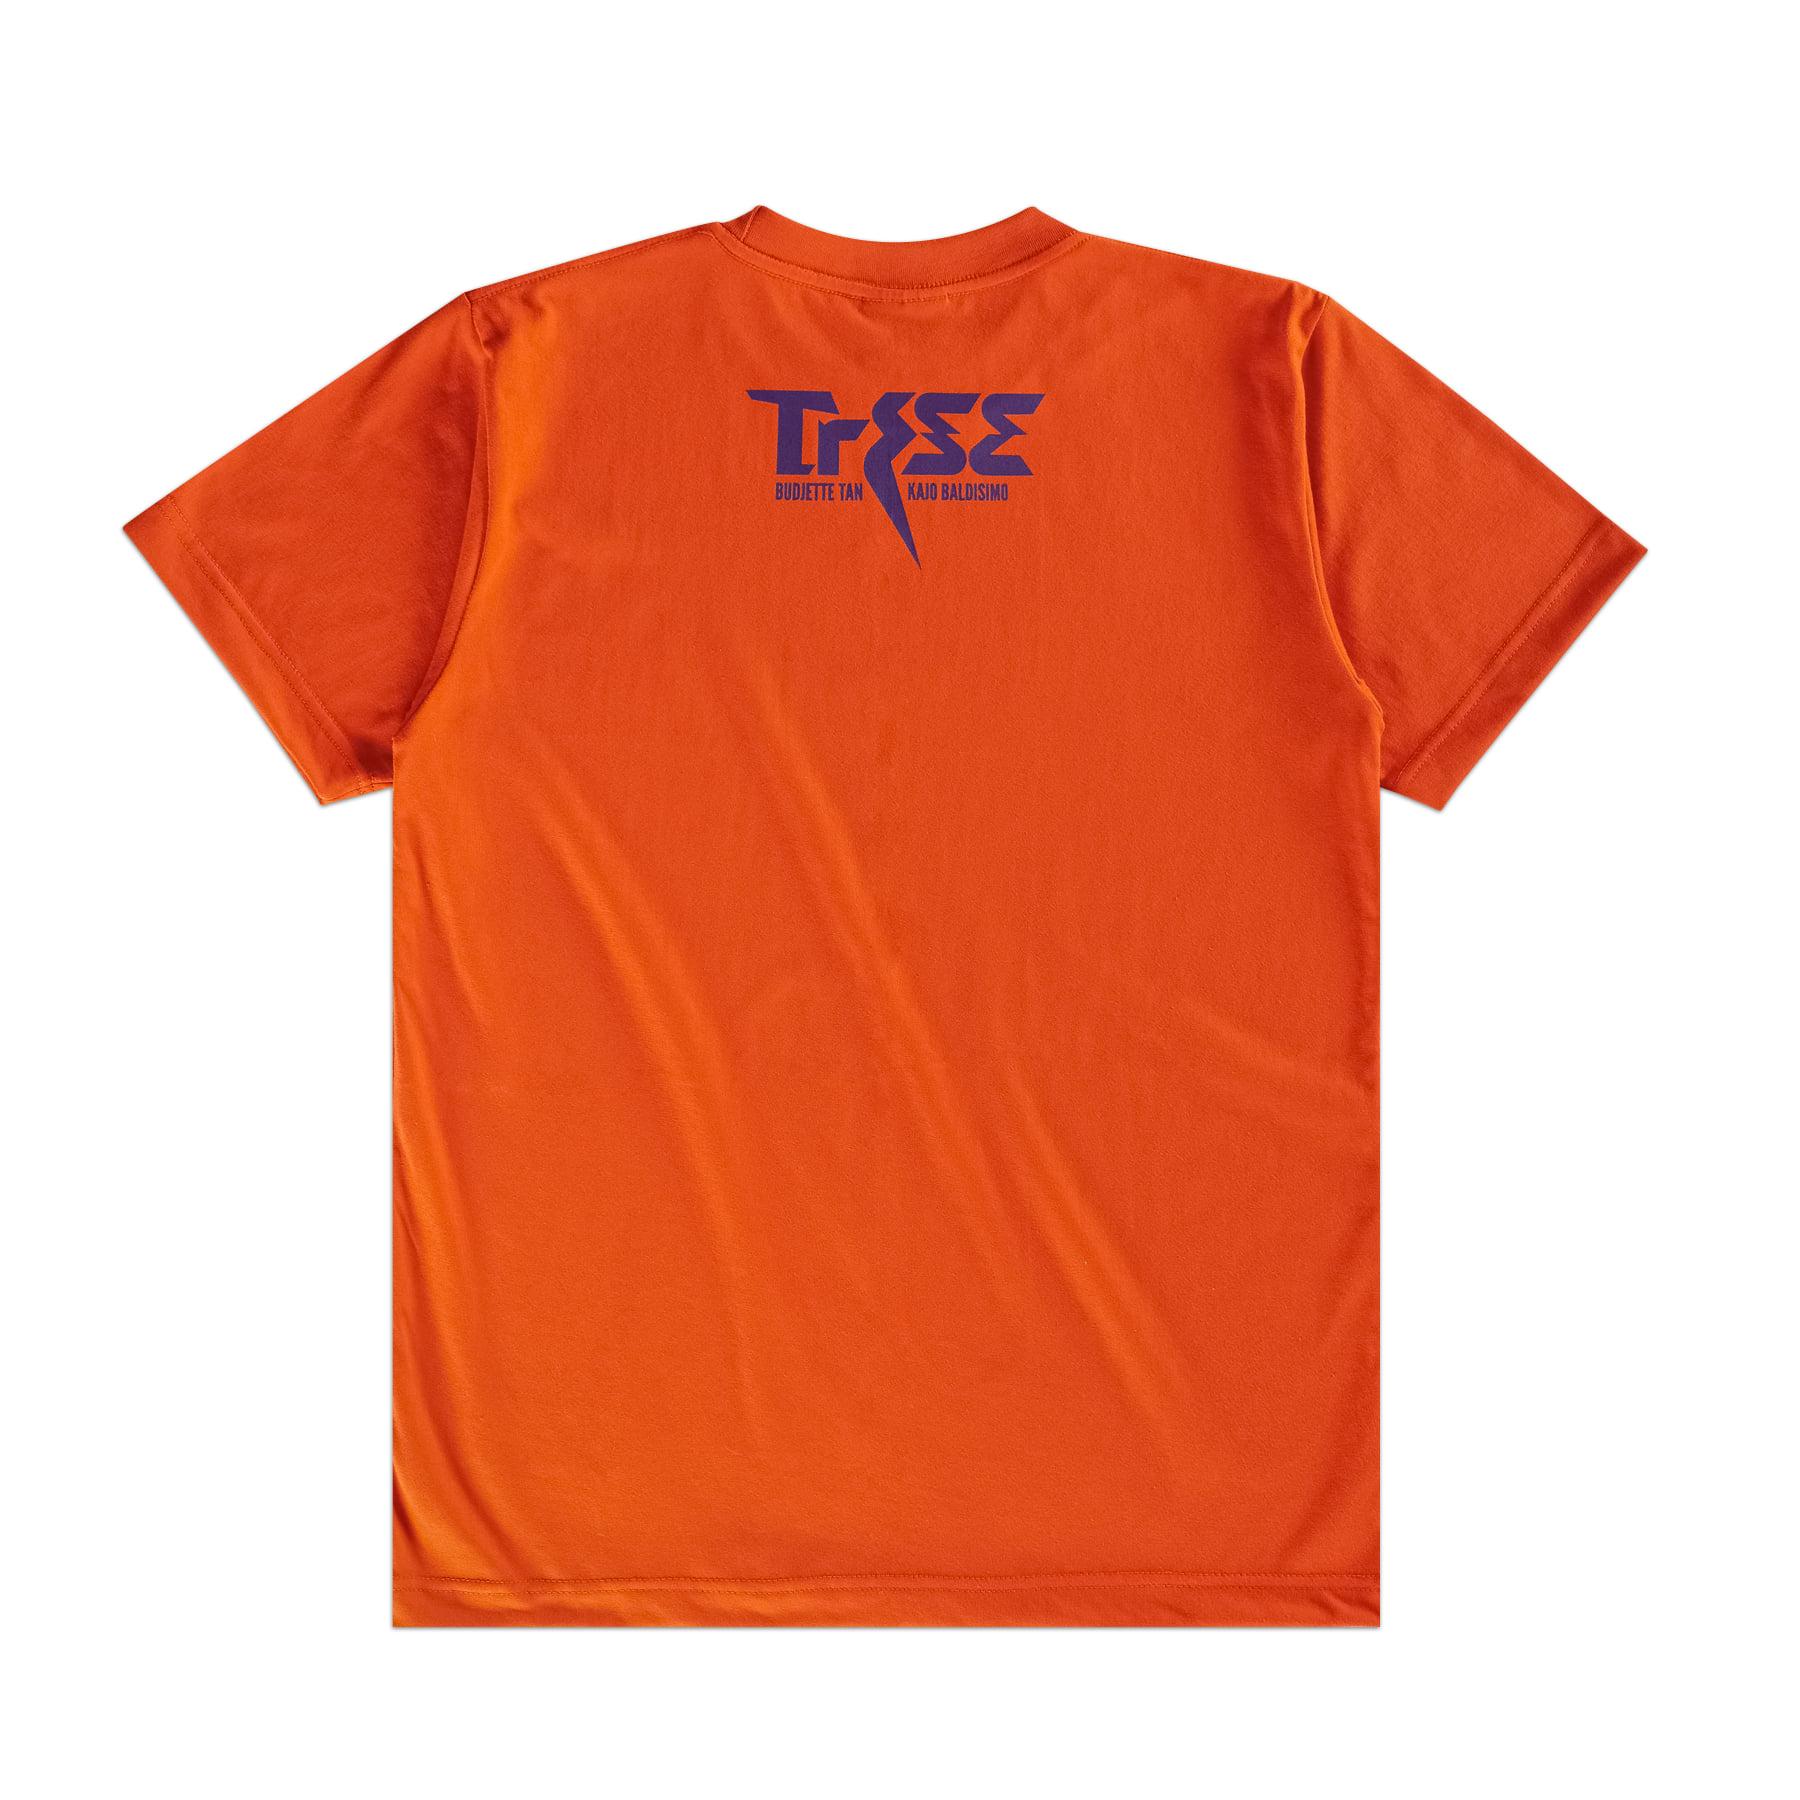 Trese inspired shirt by Dan Matutina x Team Manila collab (back)